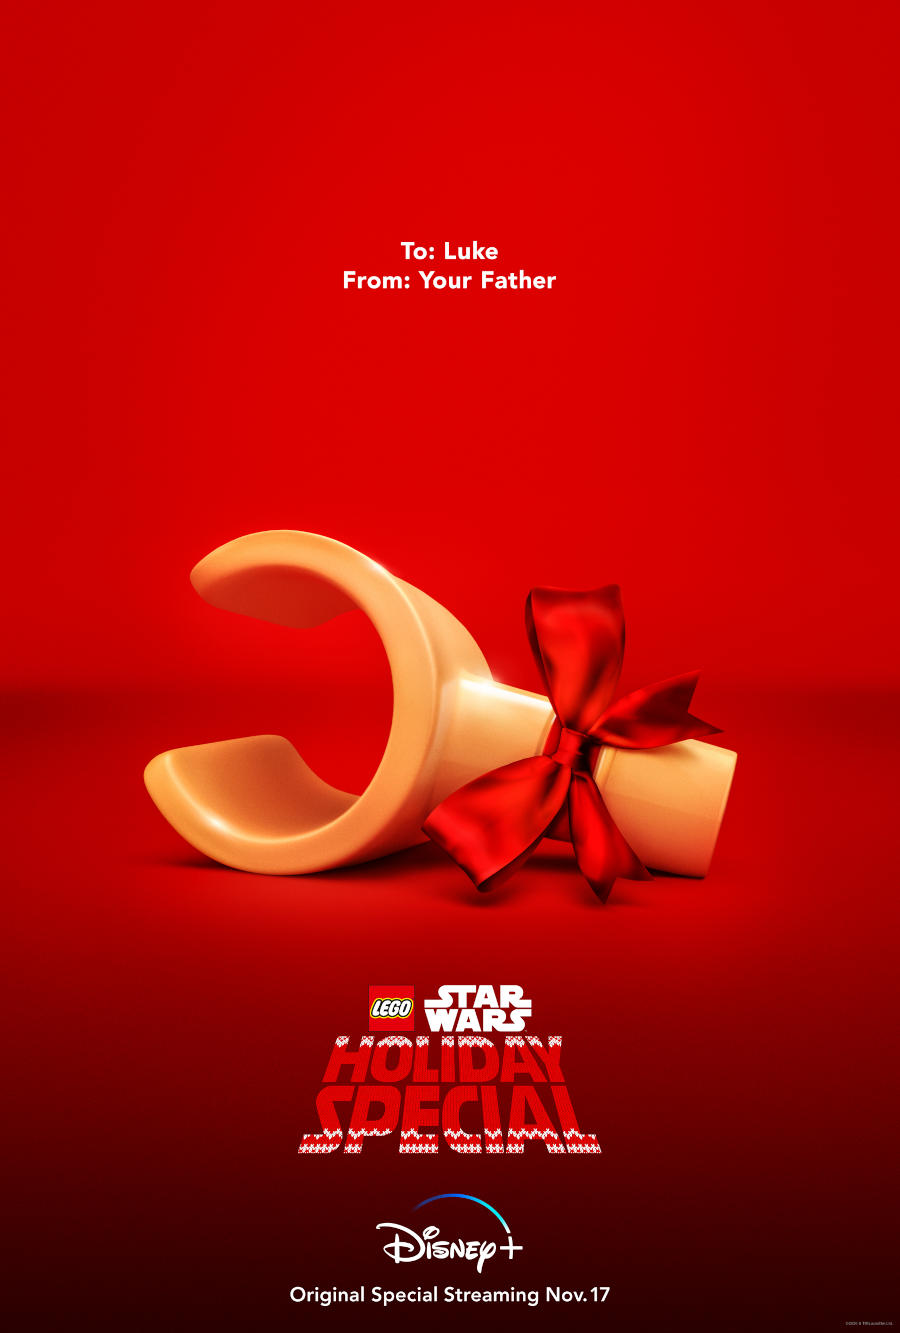 Image Source: Disney+